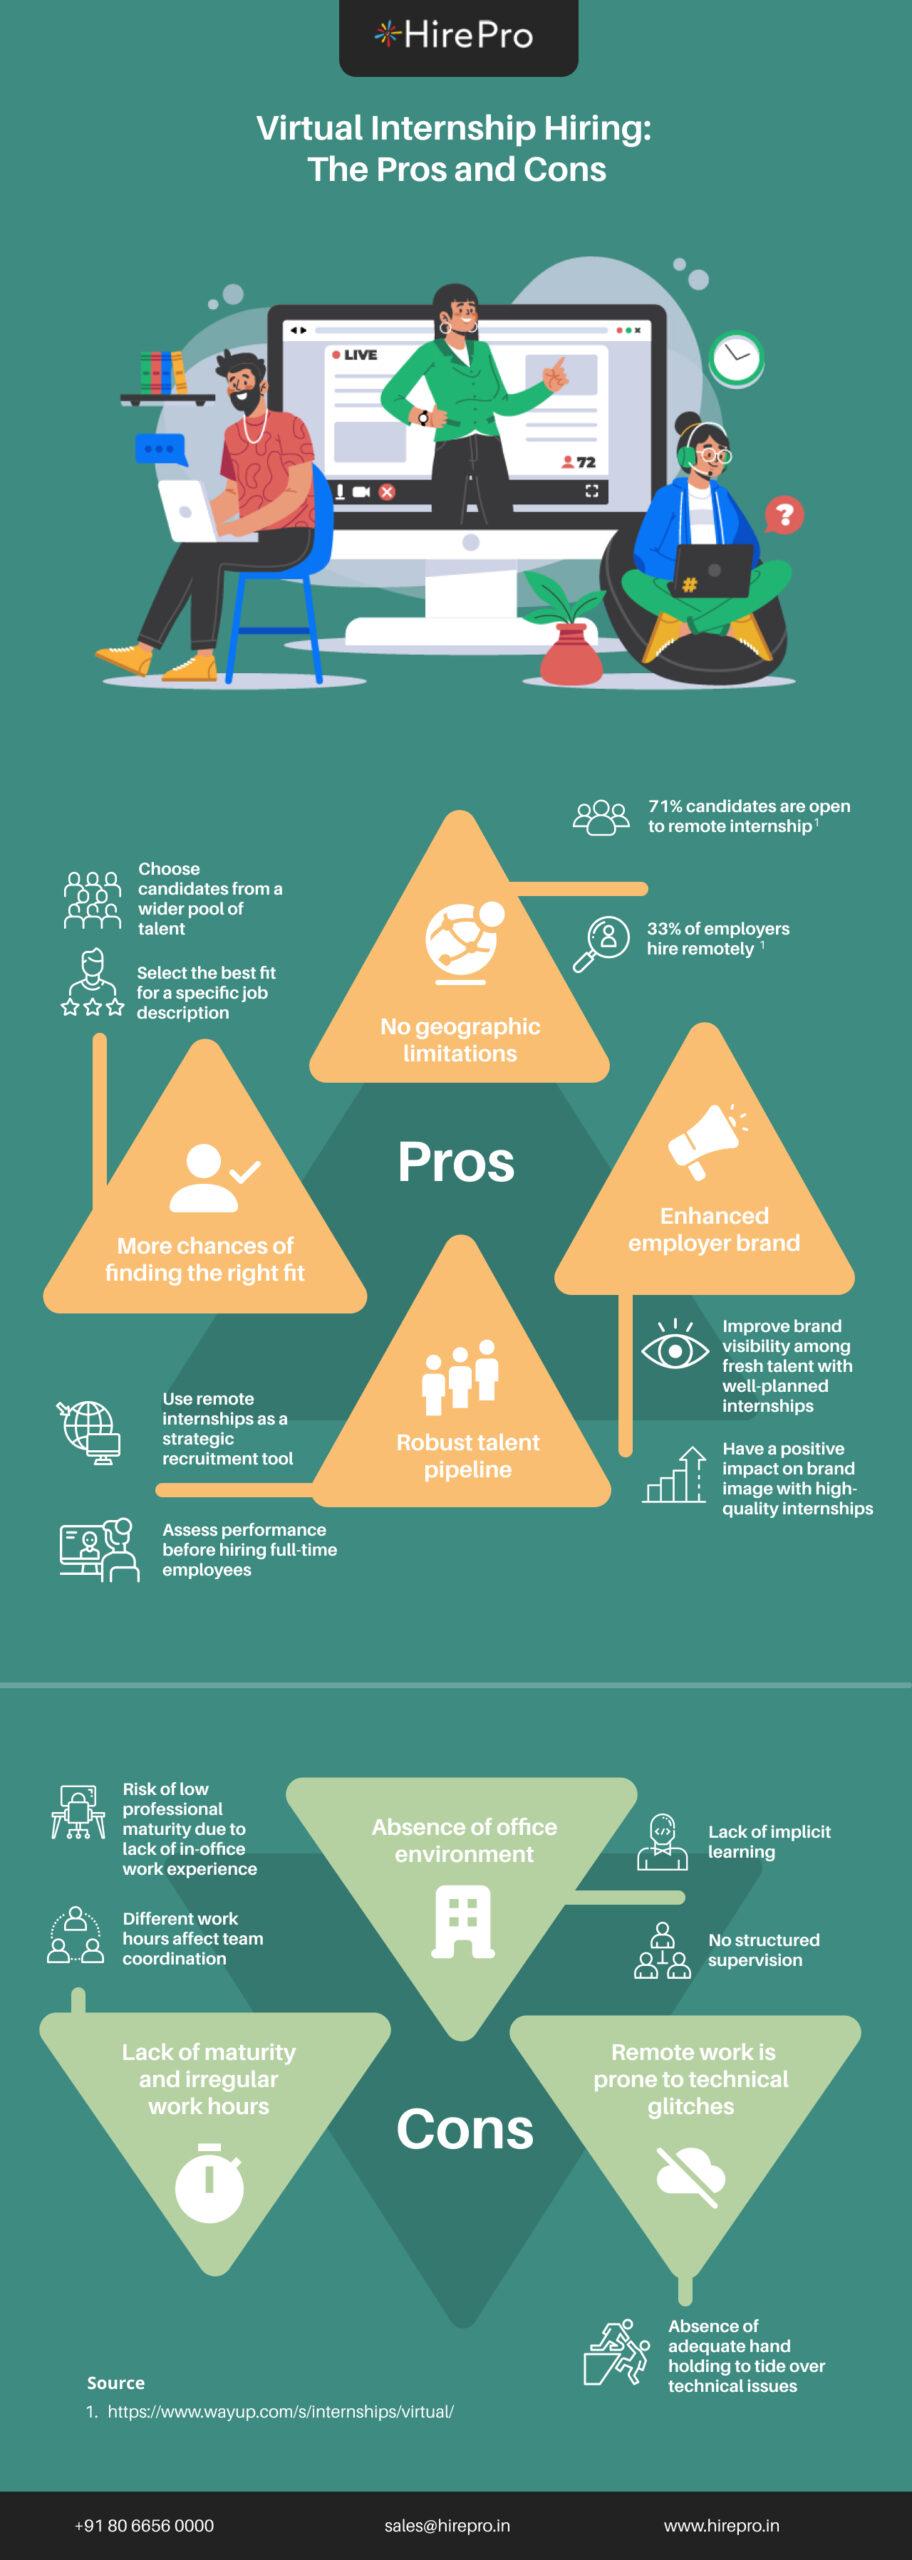 The Pros and Cons of Virtual Internship hiring